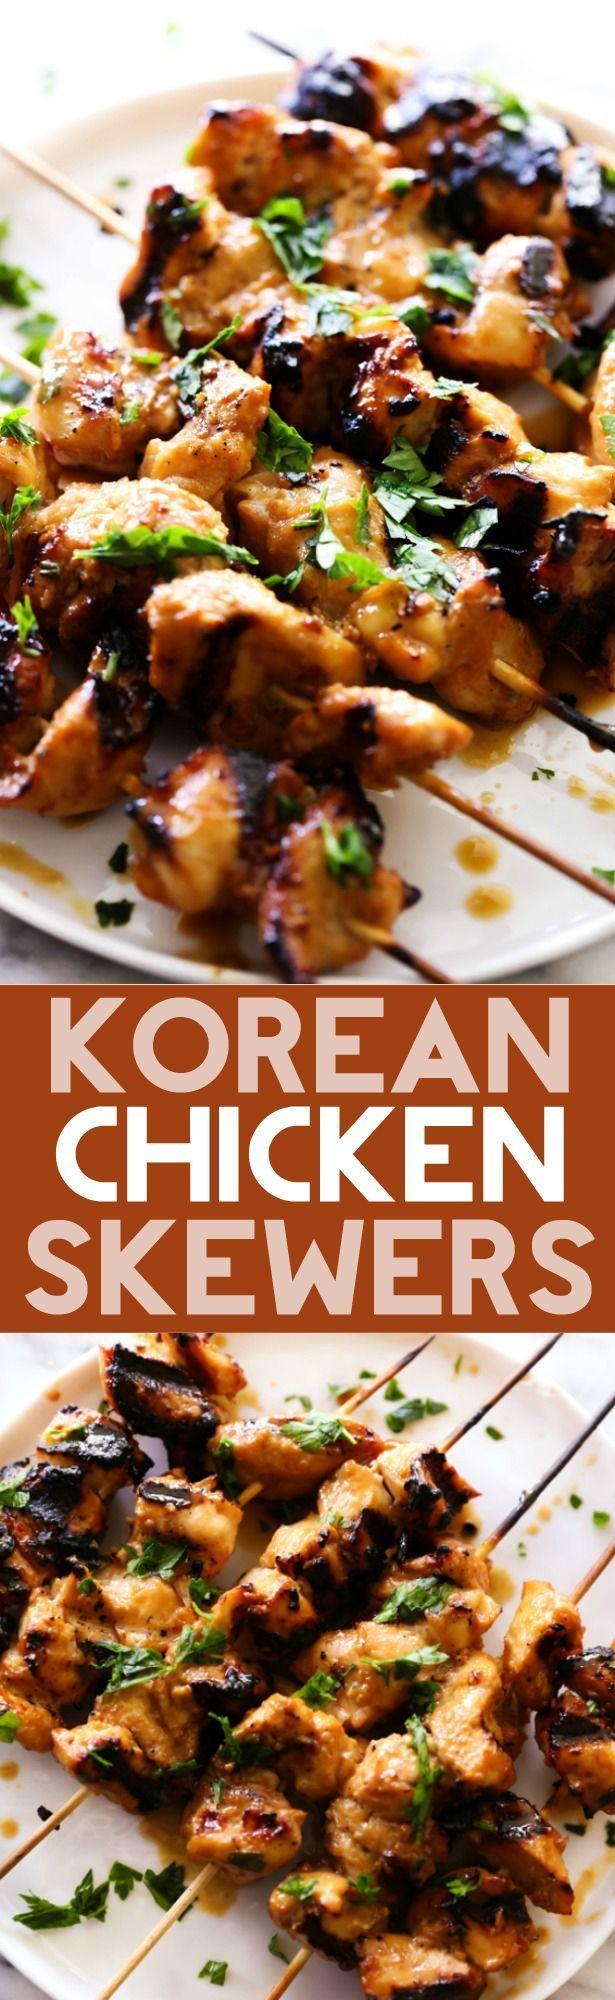 Korean Chicken Skewers - Chef in Training